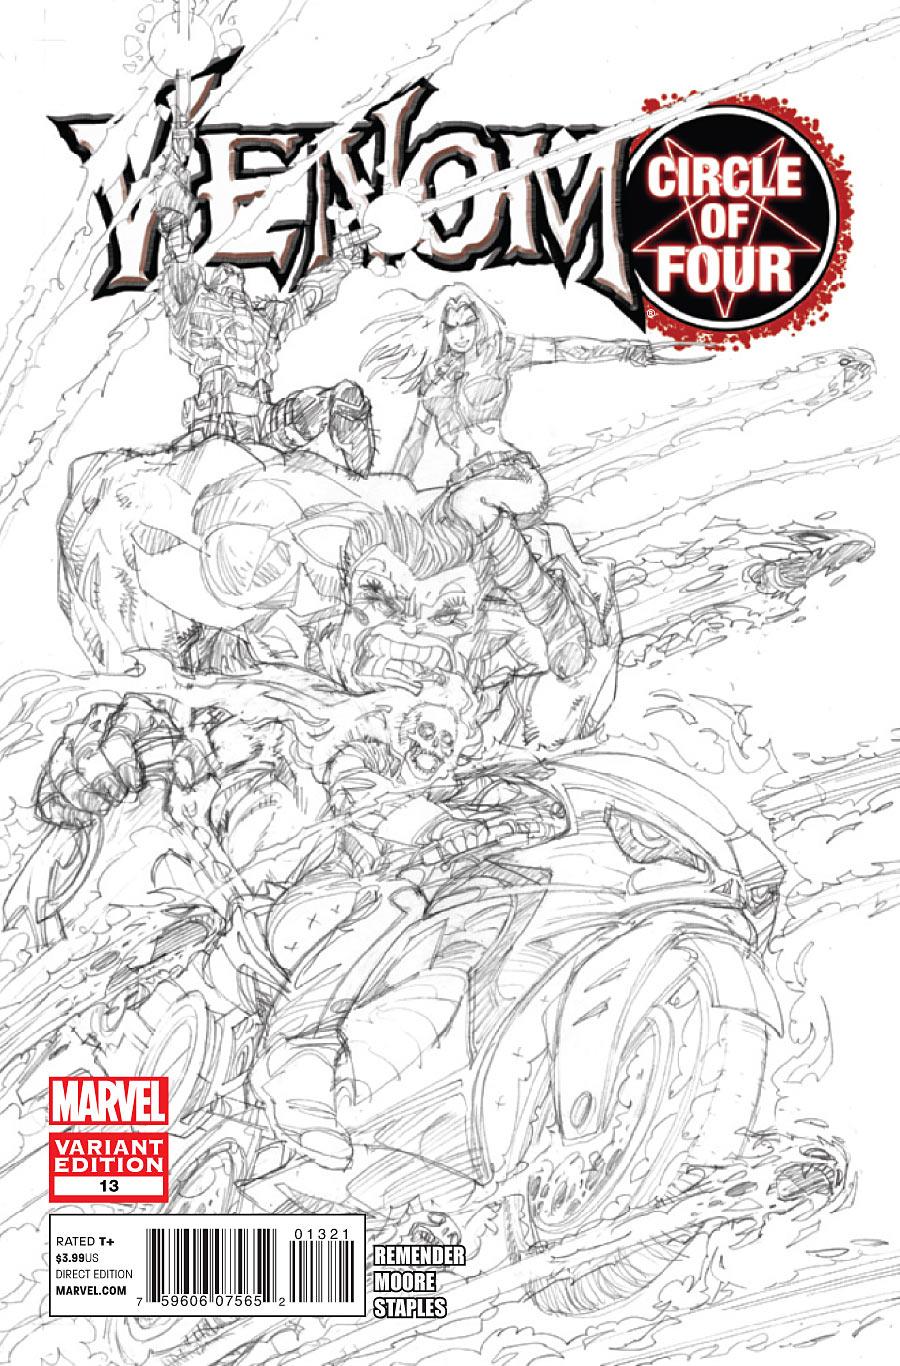 Venom Vol 2 13 Walt Simonson Sketch Variant.jpg